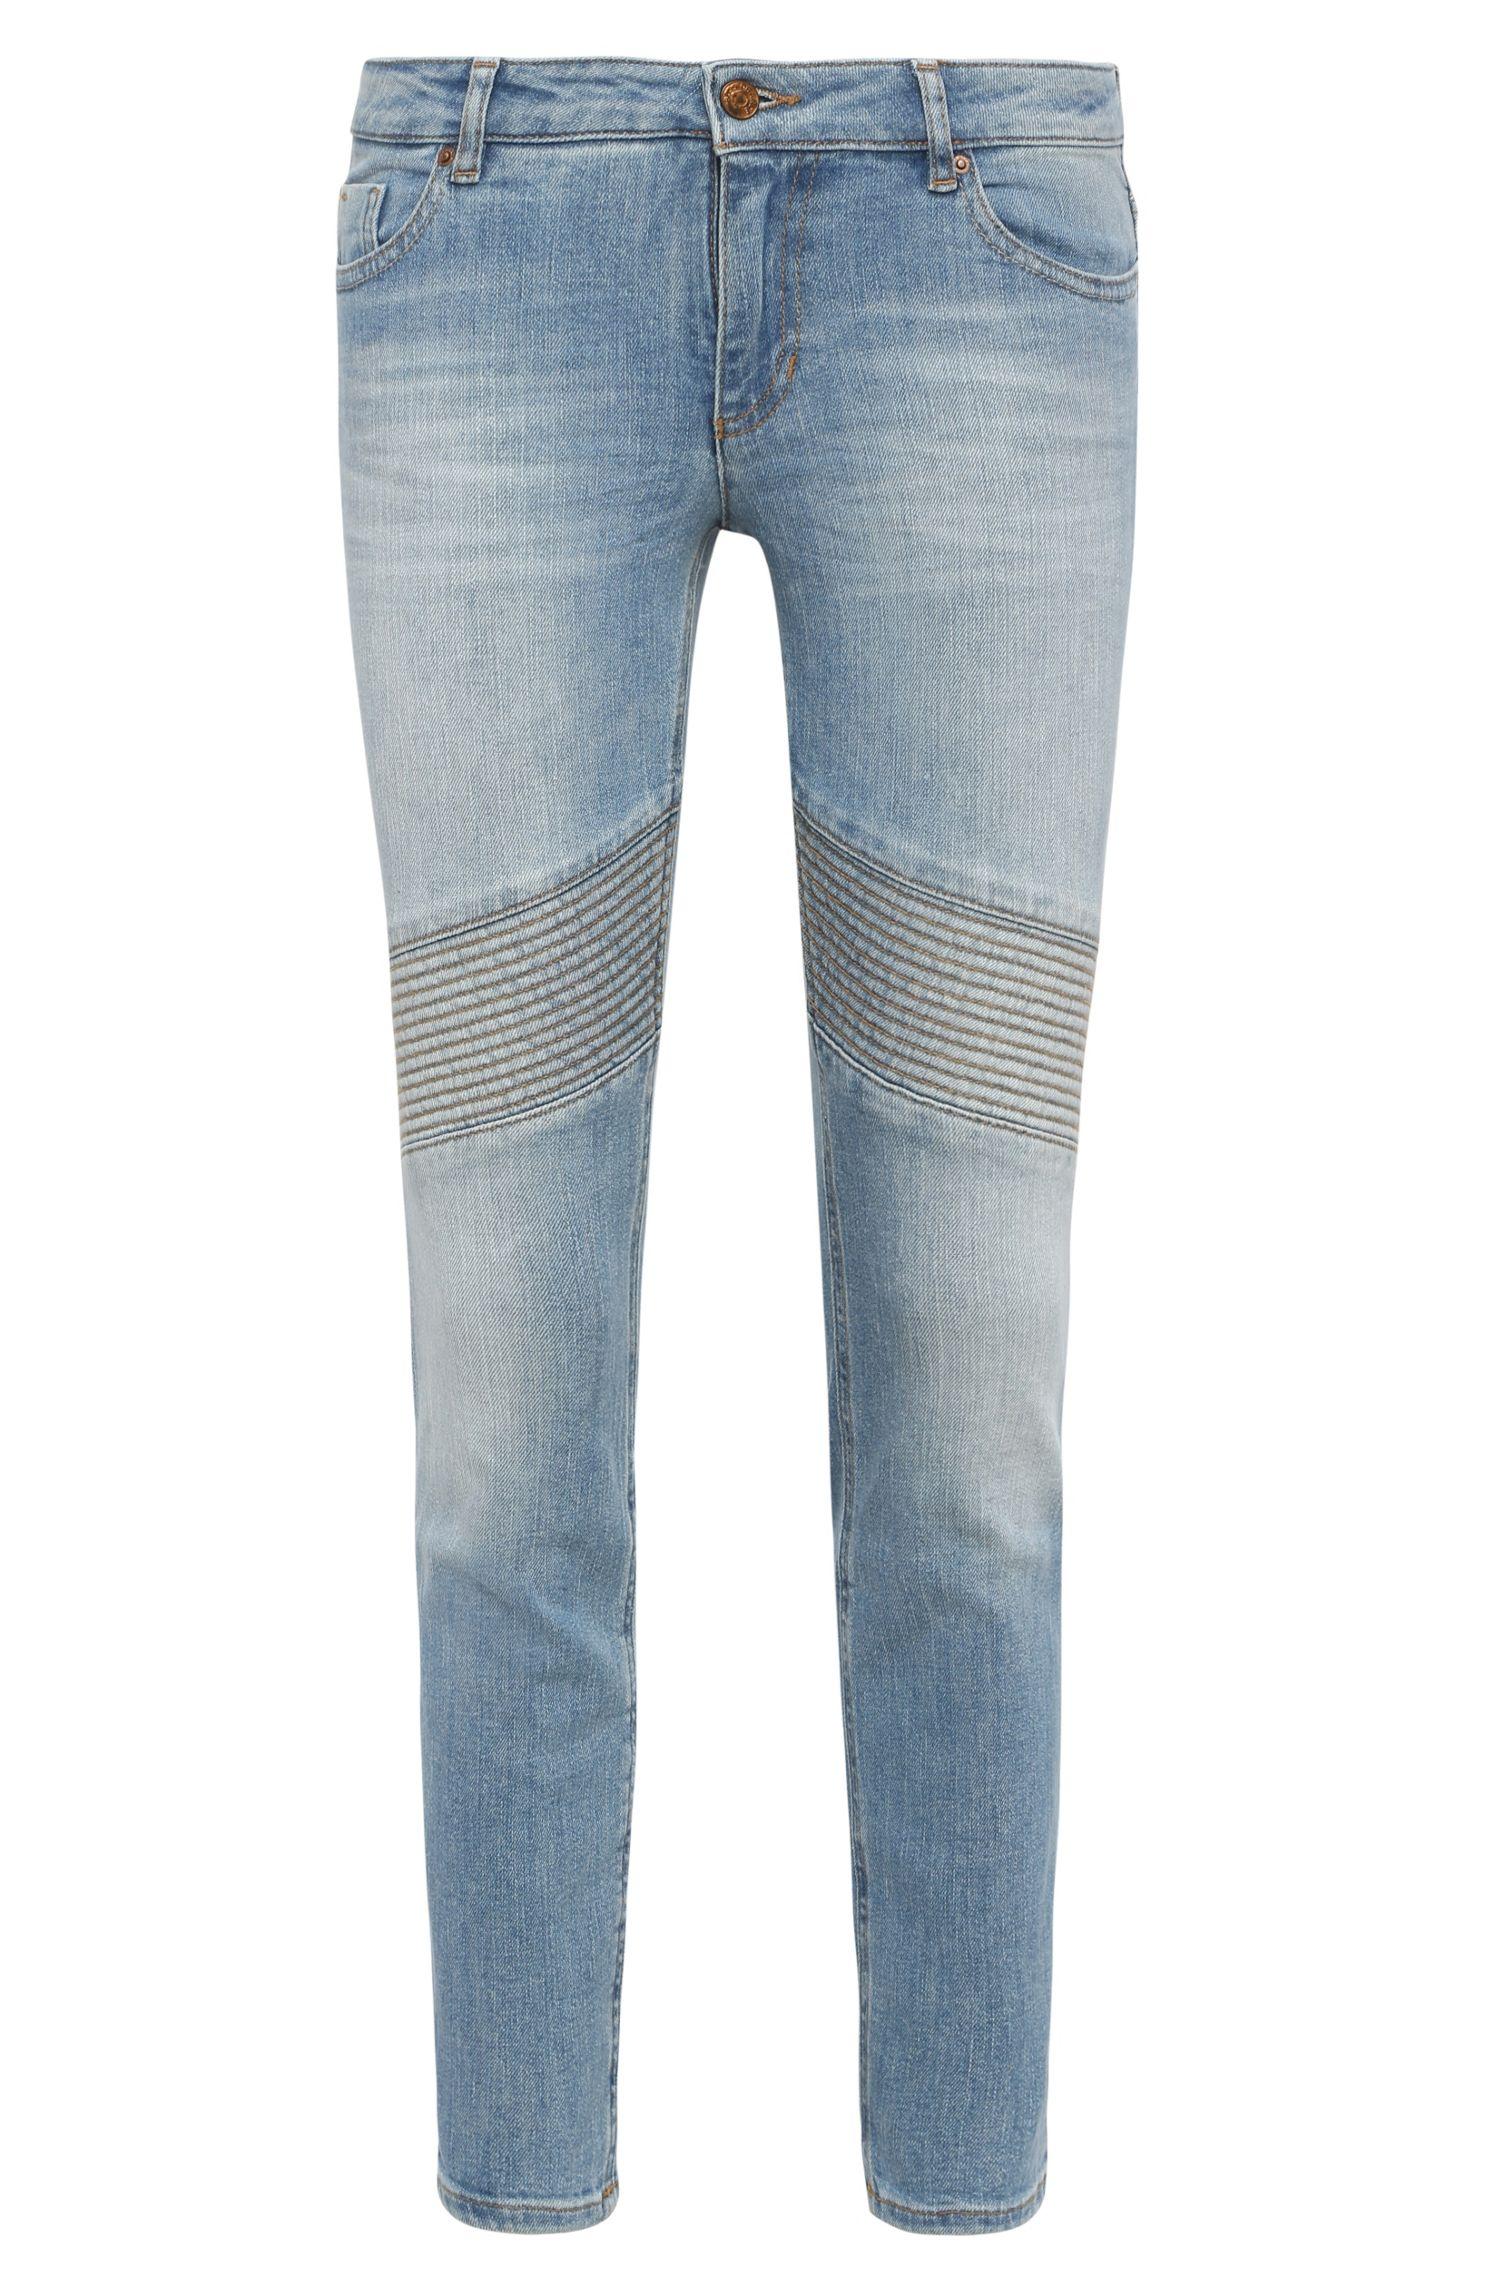 'Orange J Oslo' | Stretch Cotton Blend Moto Jeans